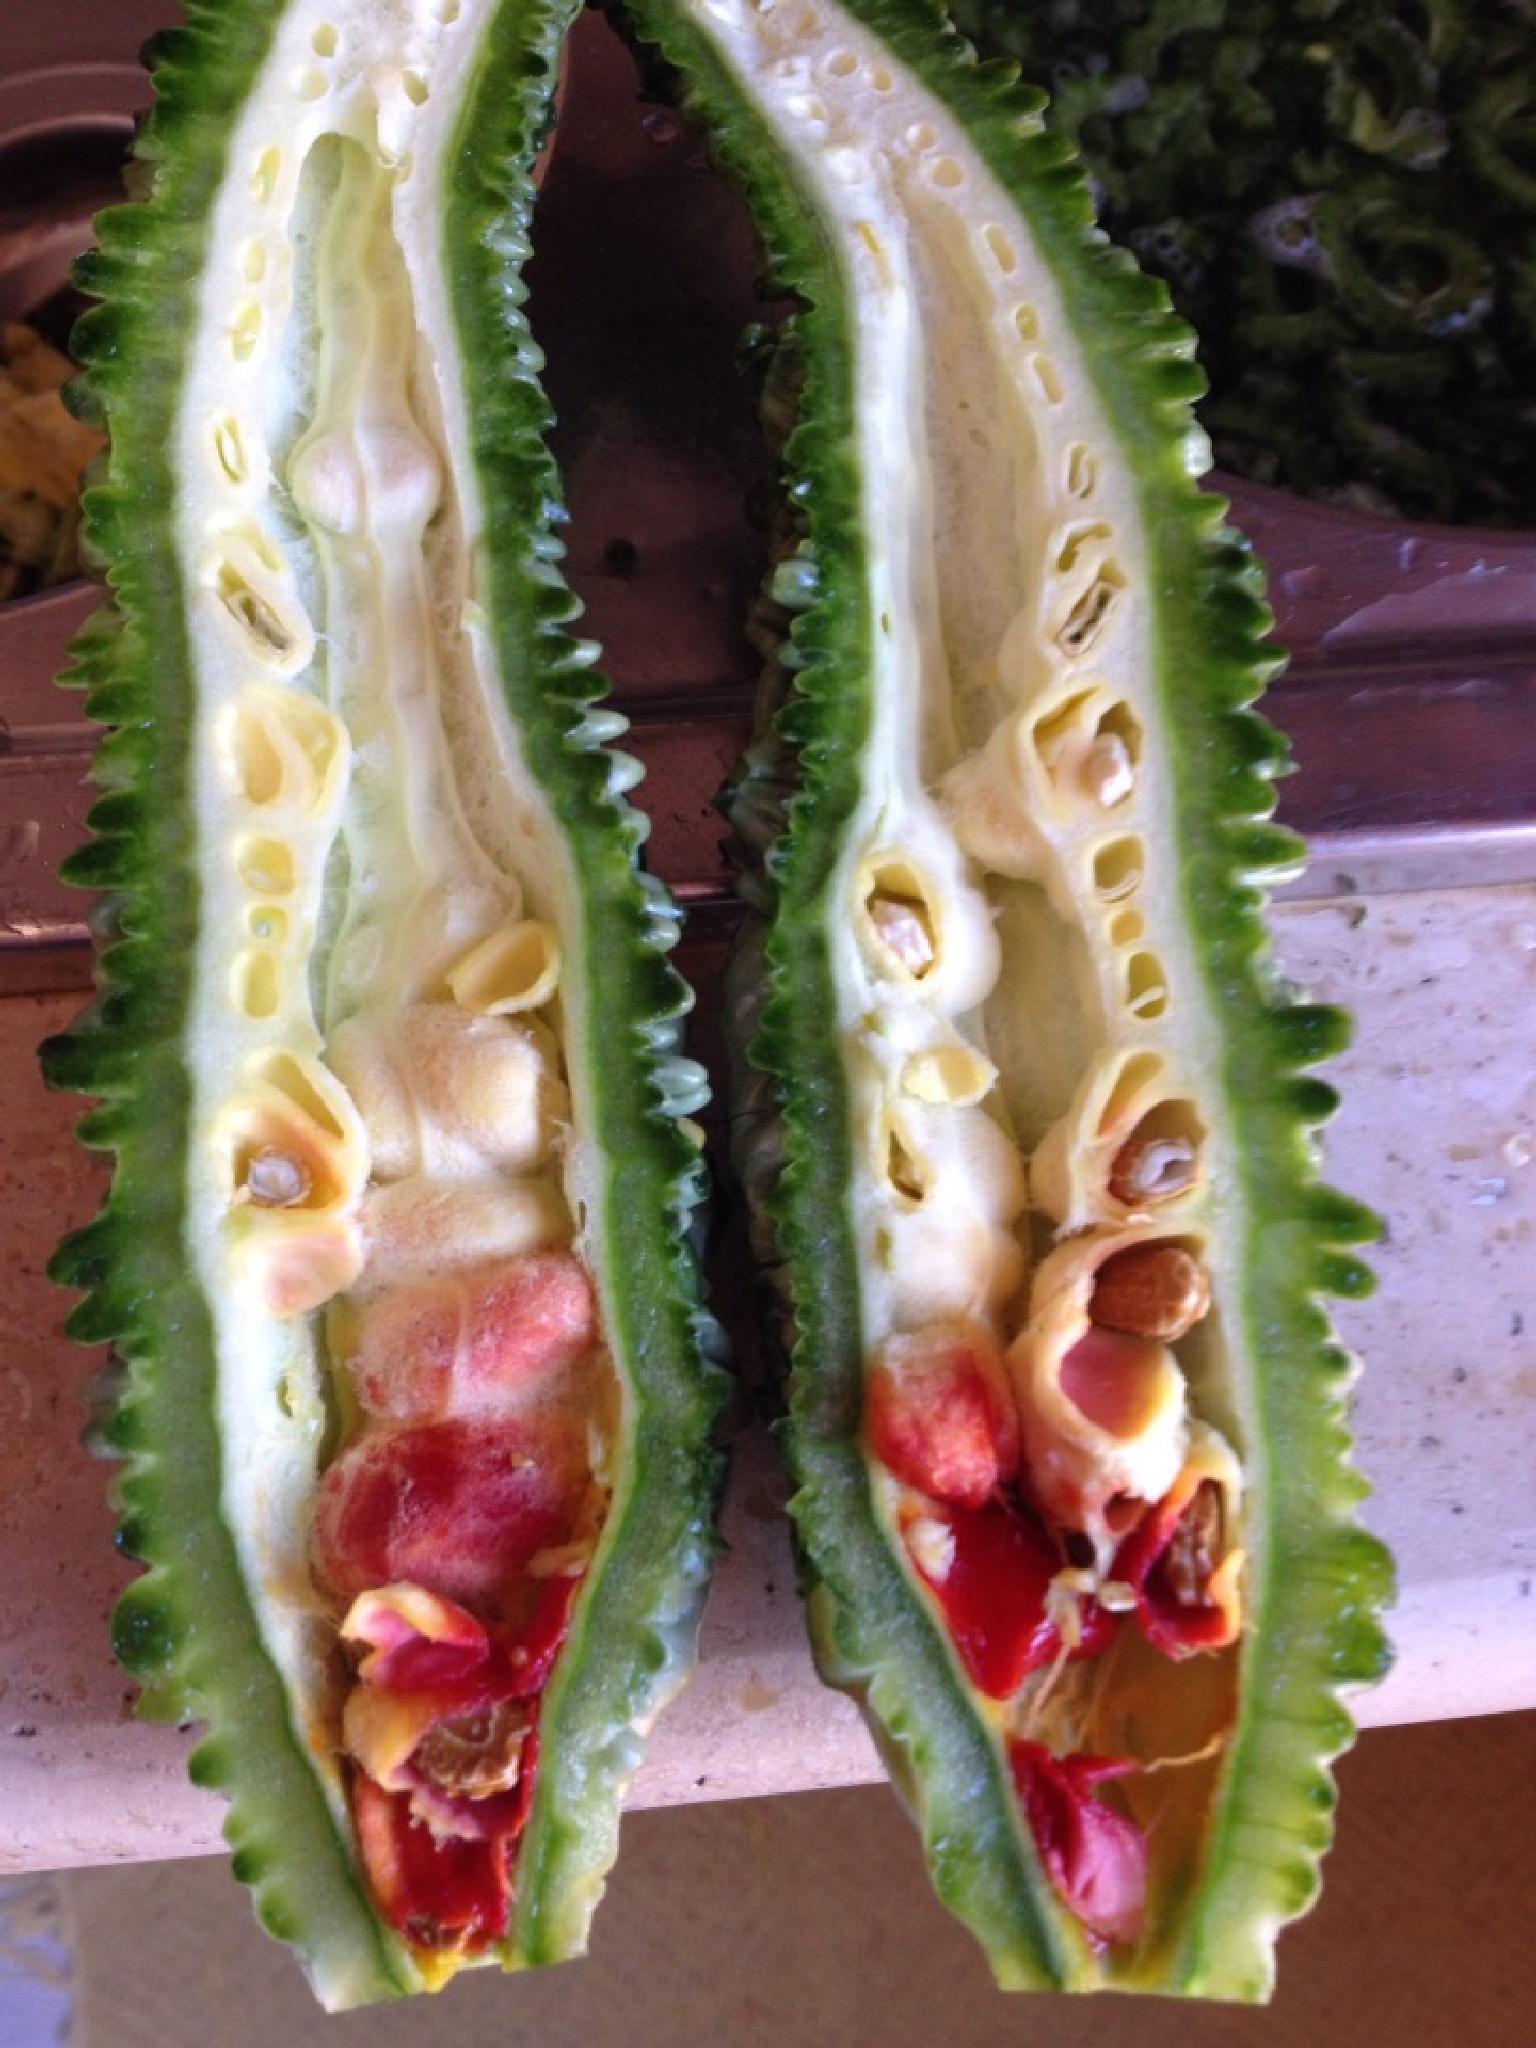 Sour cucumber, split. by grossiroma